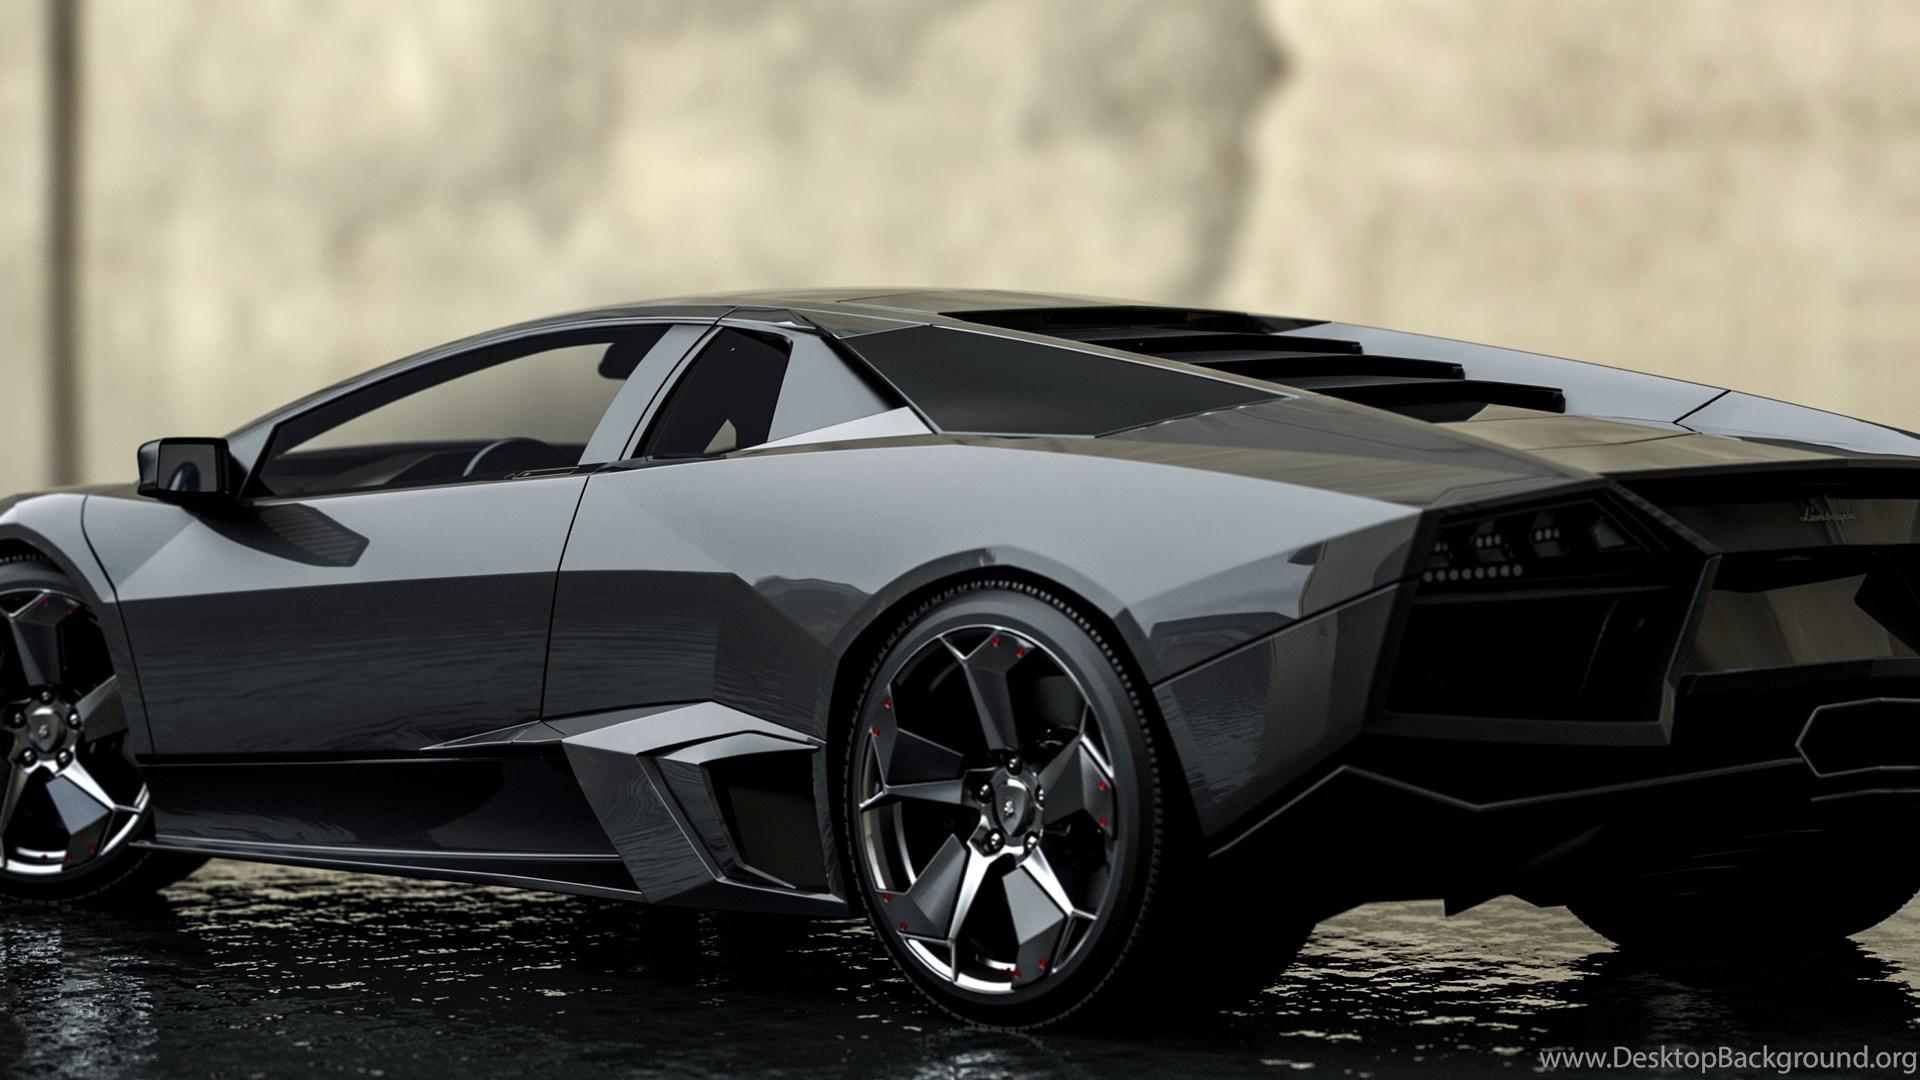 Lamborghini Reventon Wallpapers HD Download Desktop Background